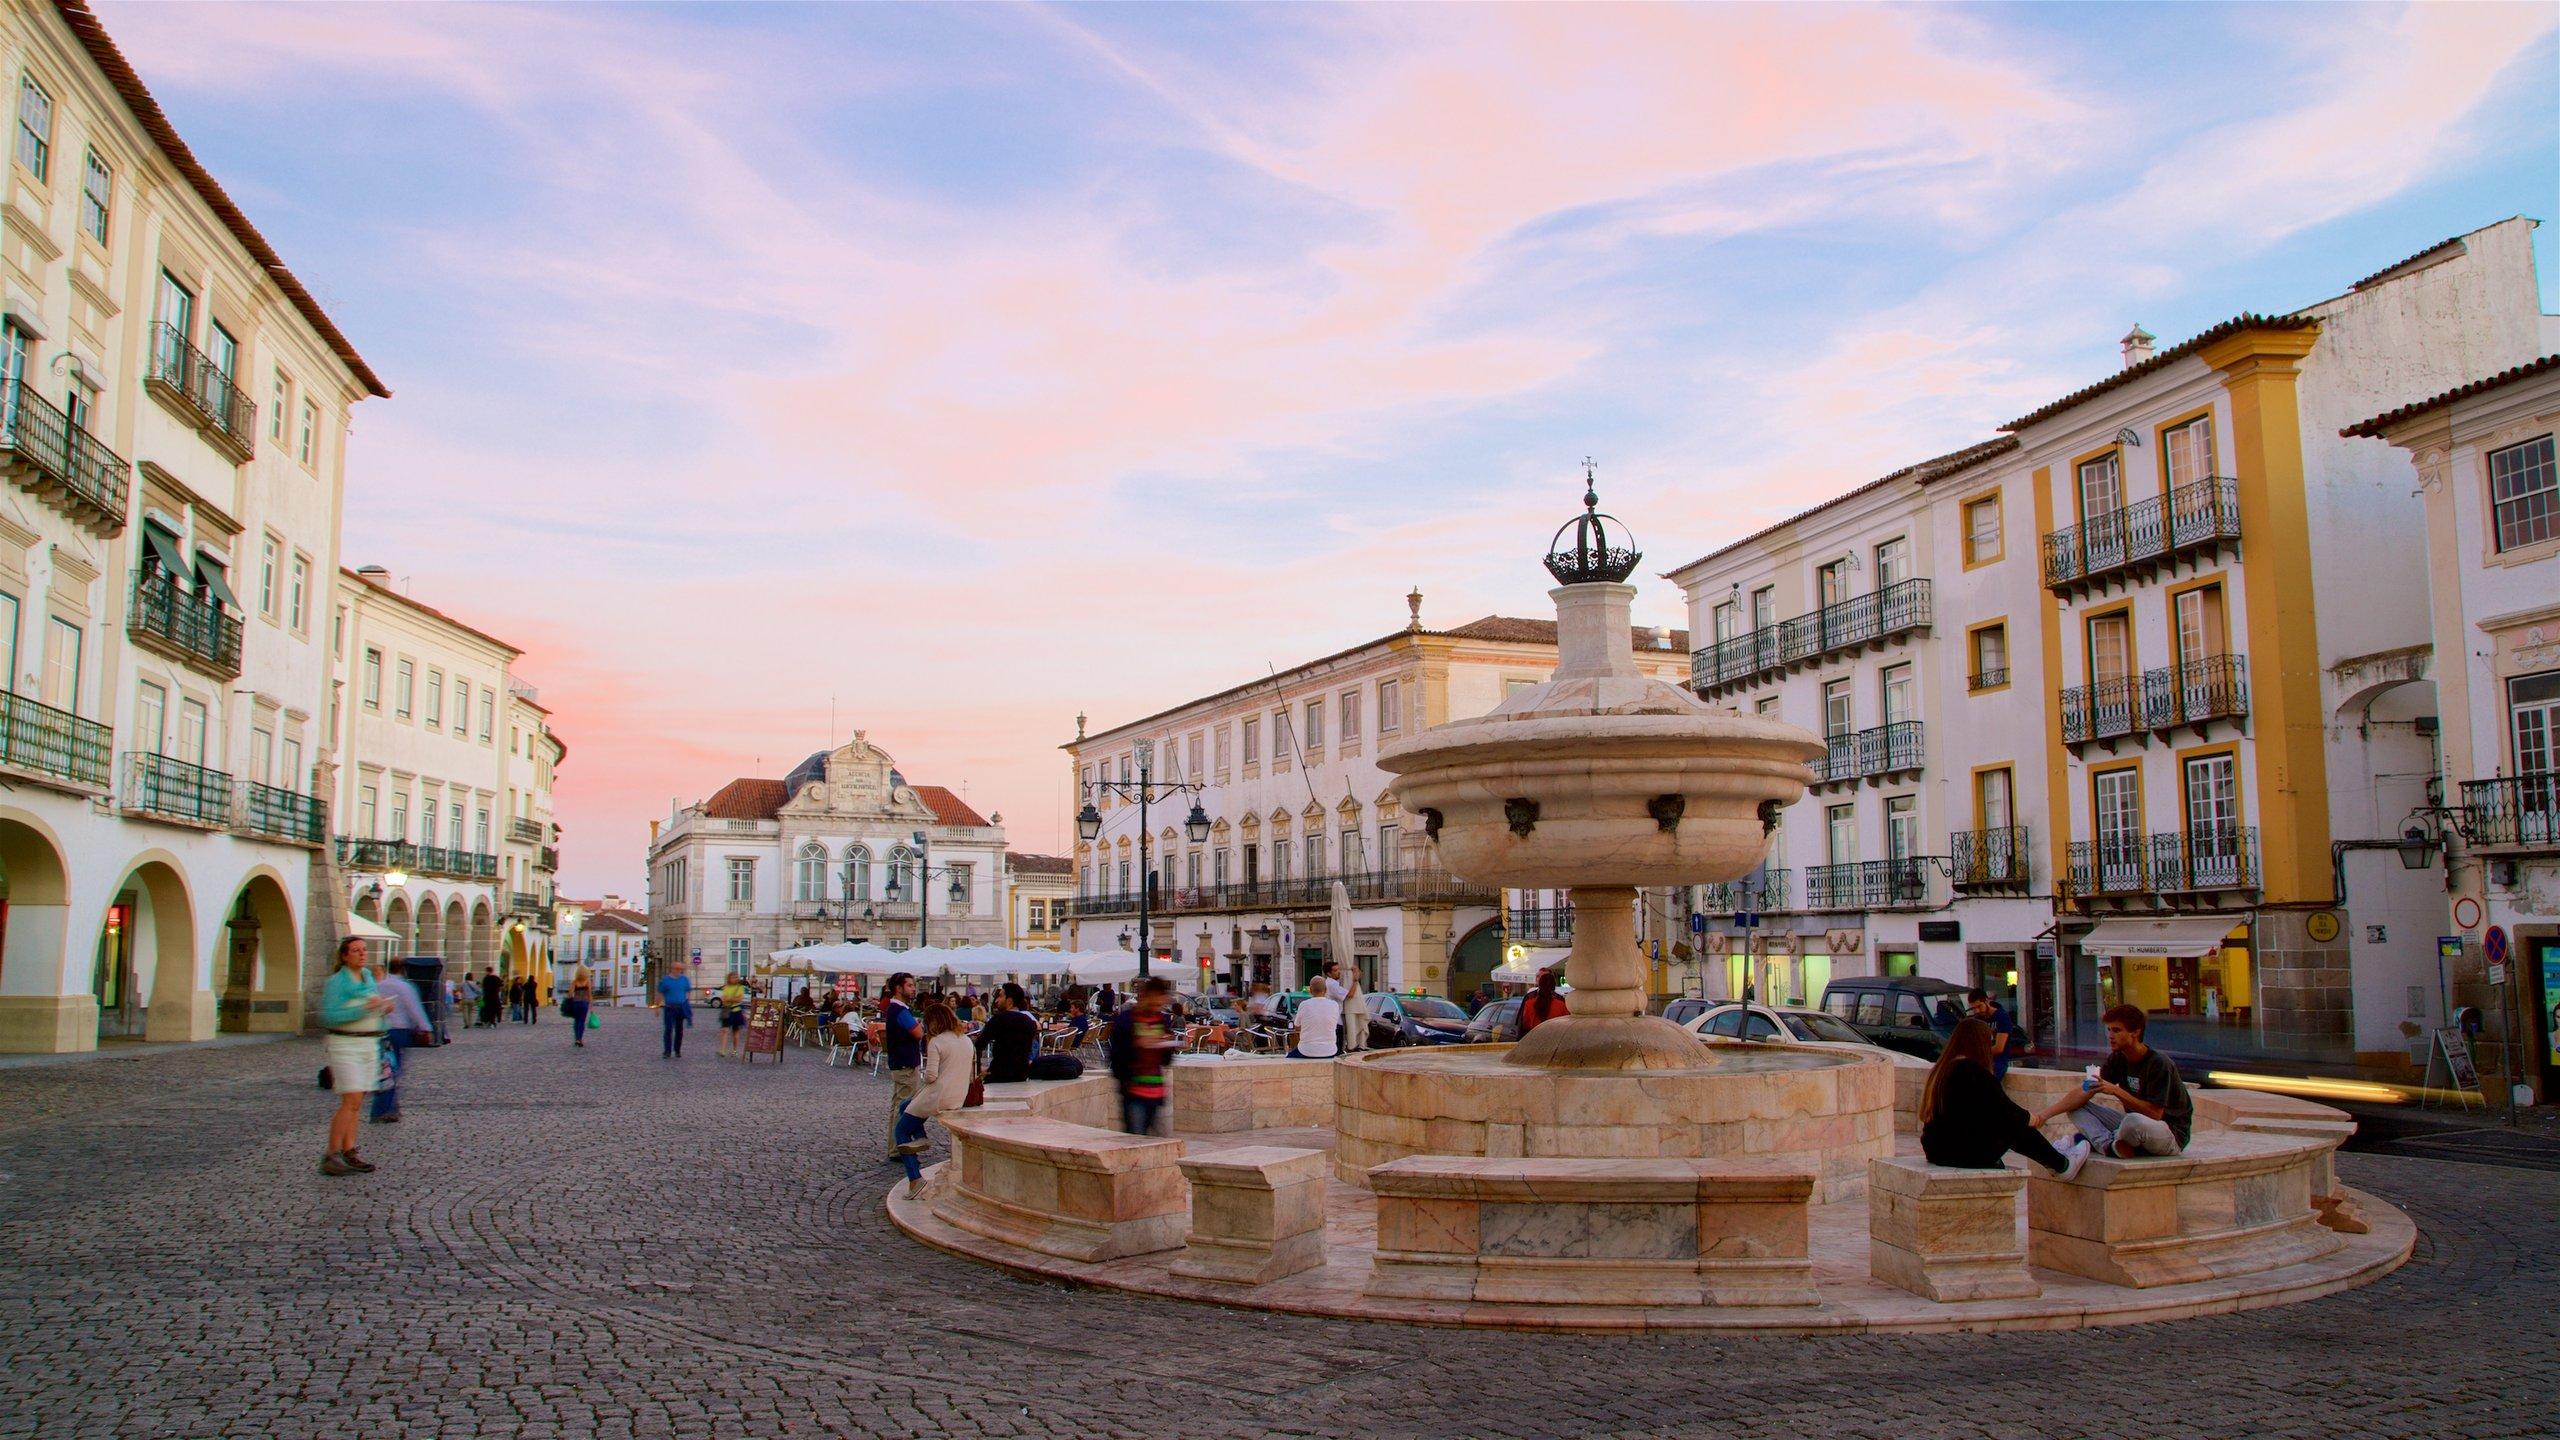 District d'Evora, Portugal